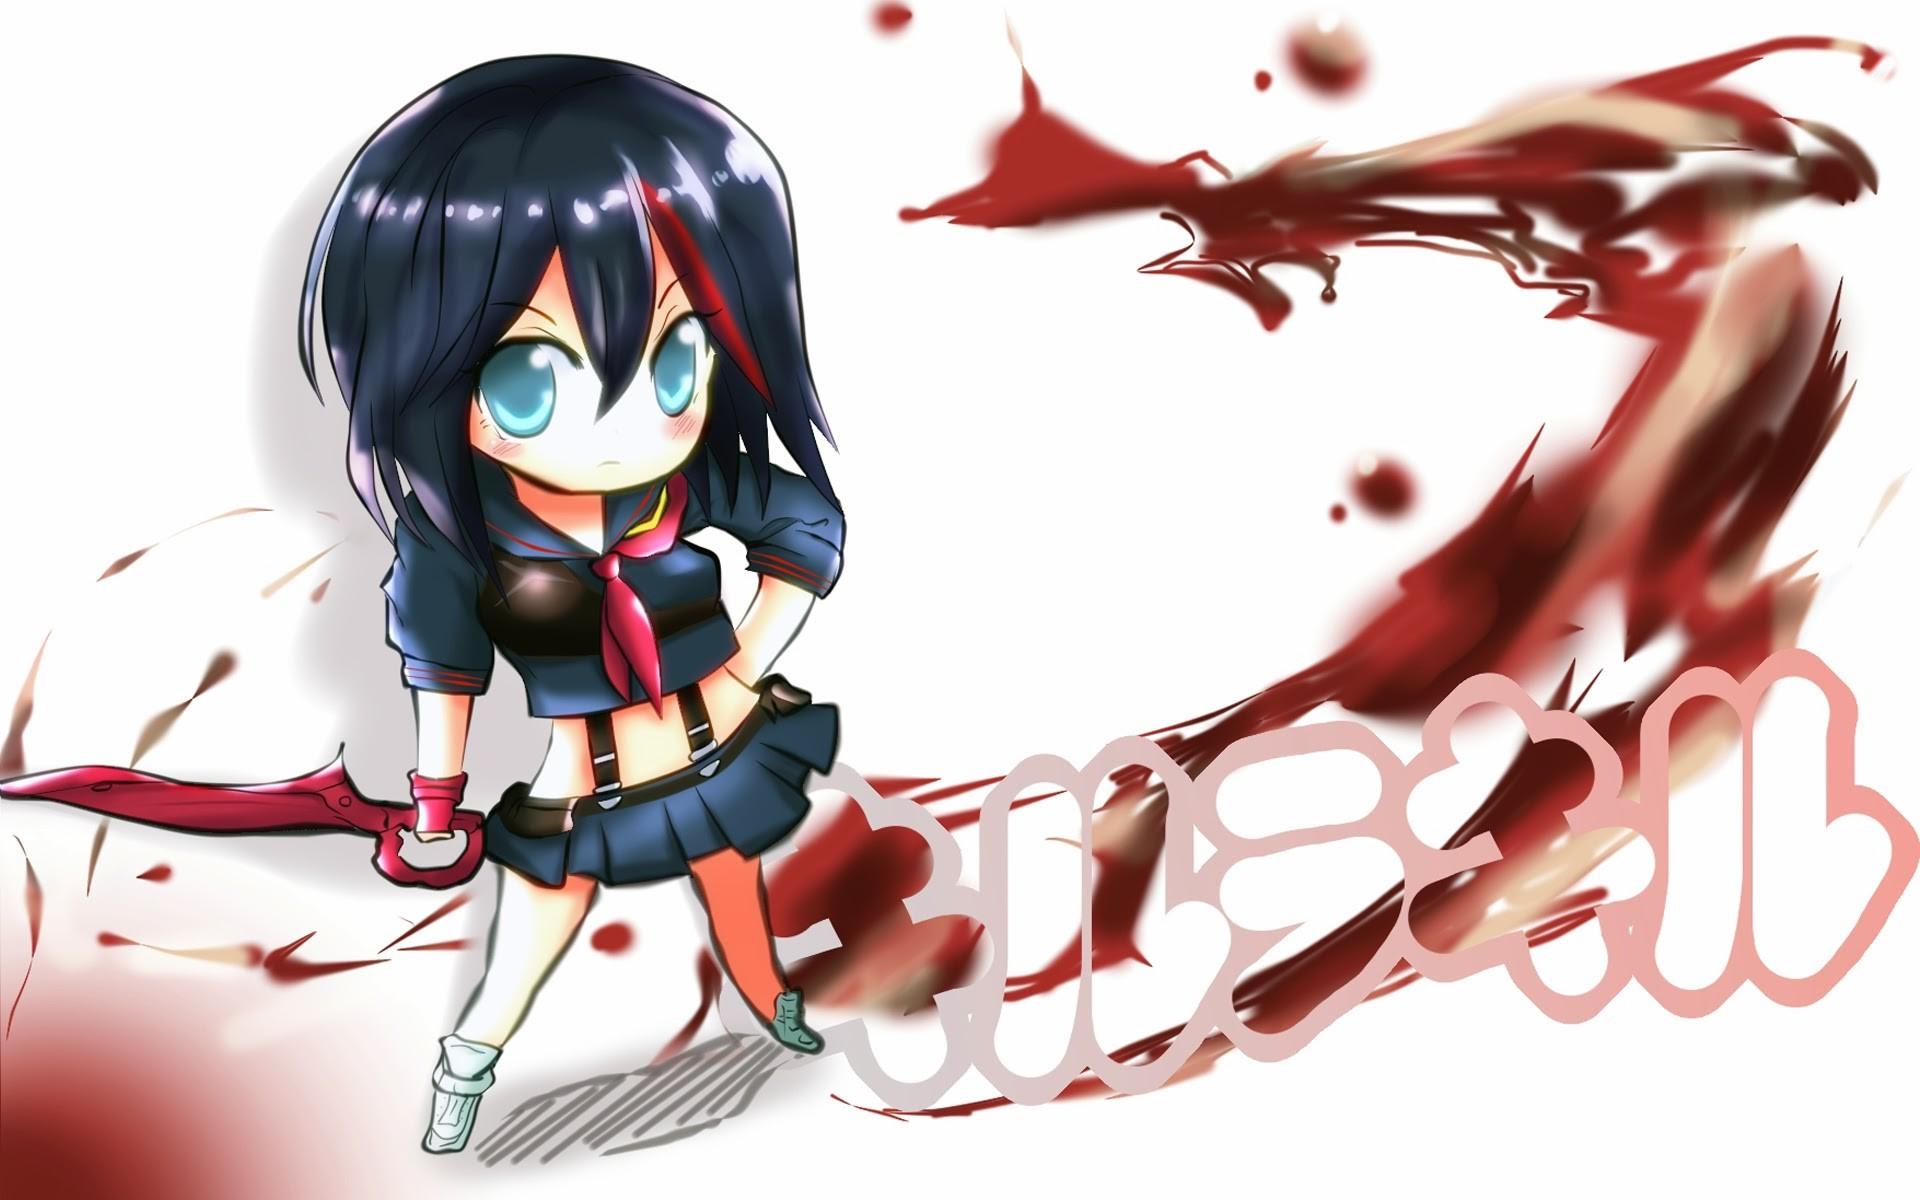 matoi ryuko chibi kill la kill anime girl image hd wallpaper .